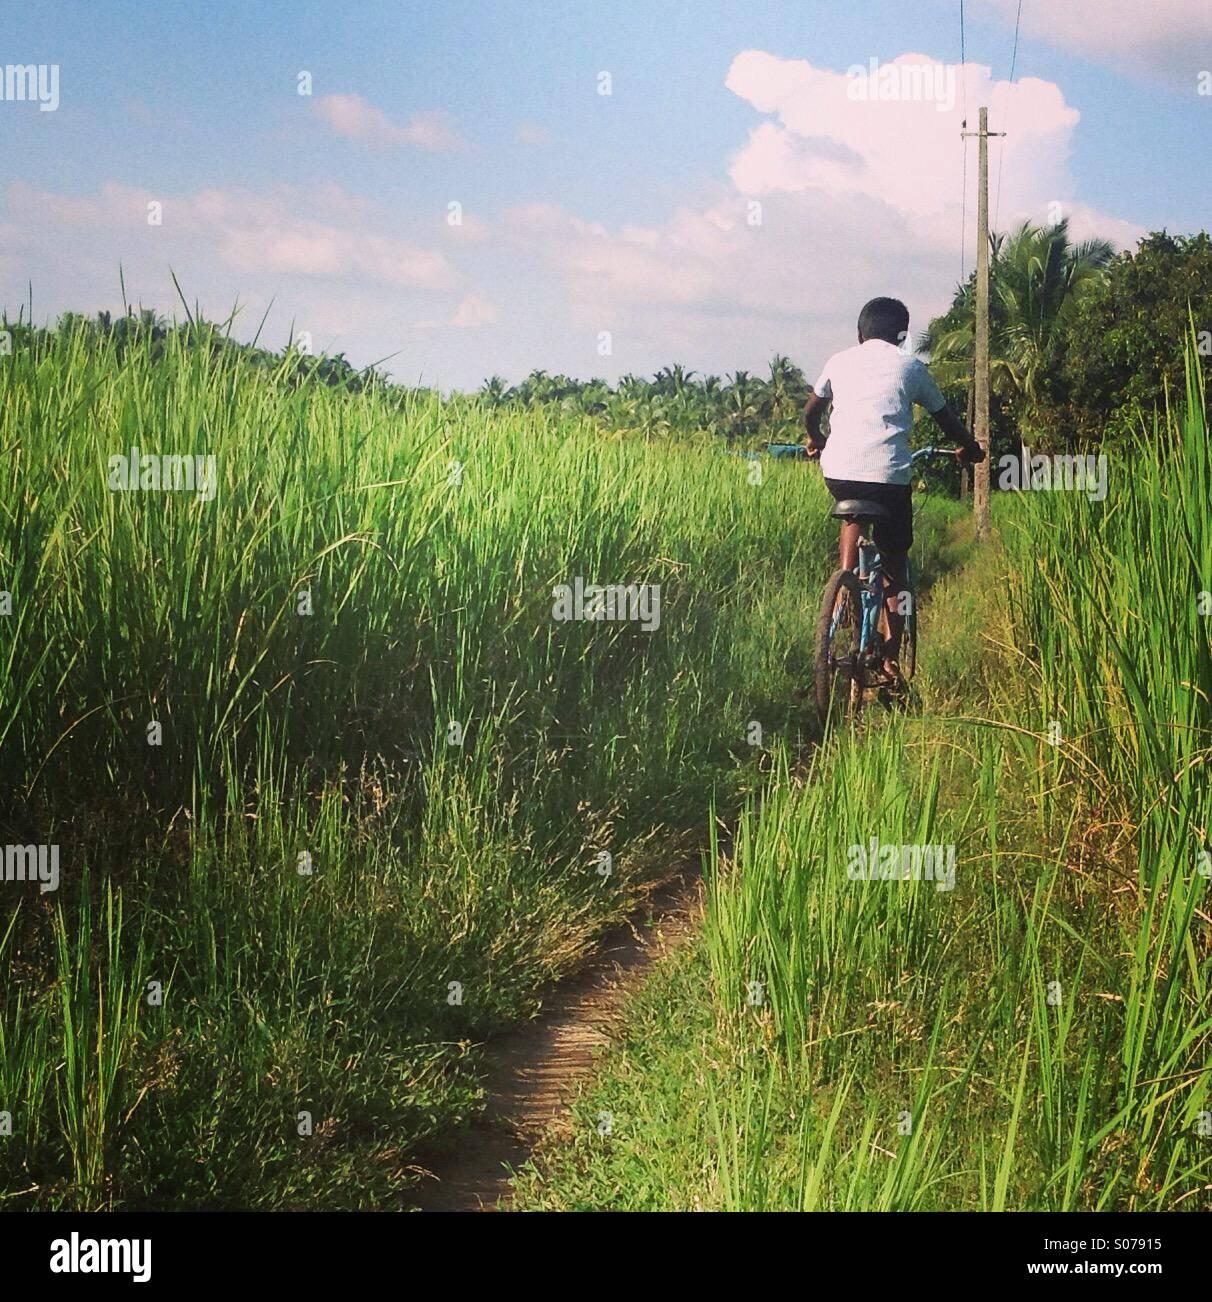 Boy cycling through rice fields in rural Kerala, India - Stock Image